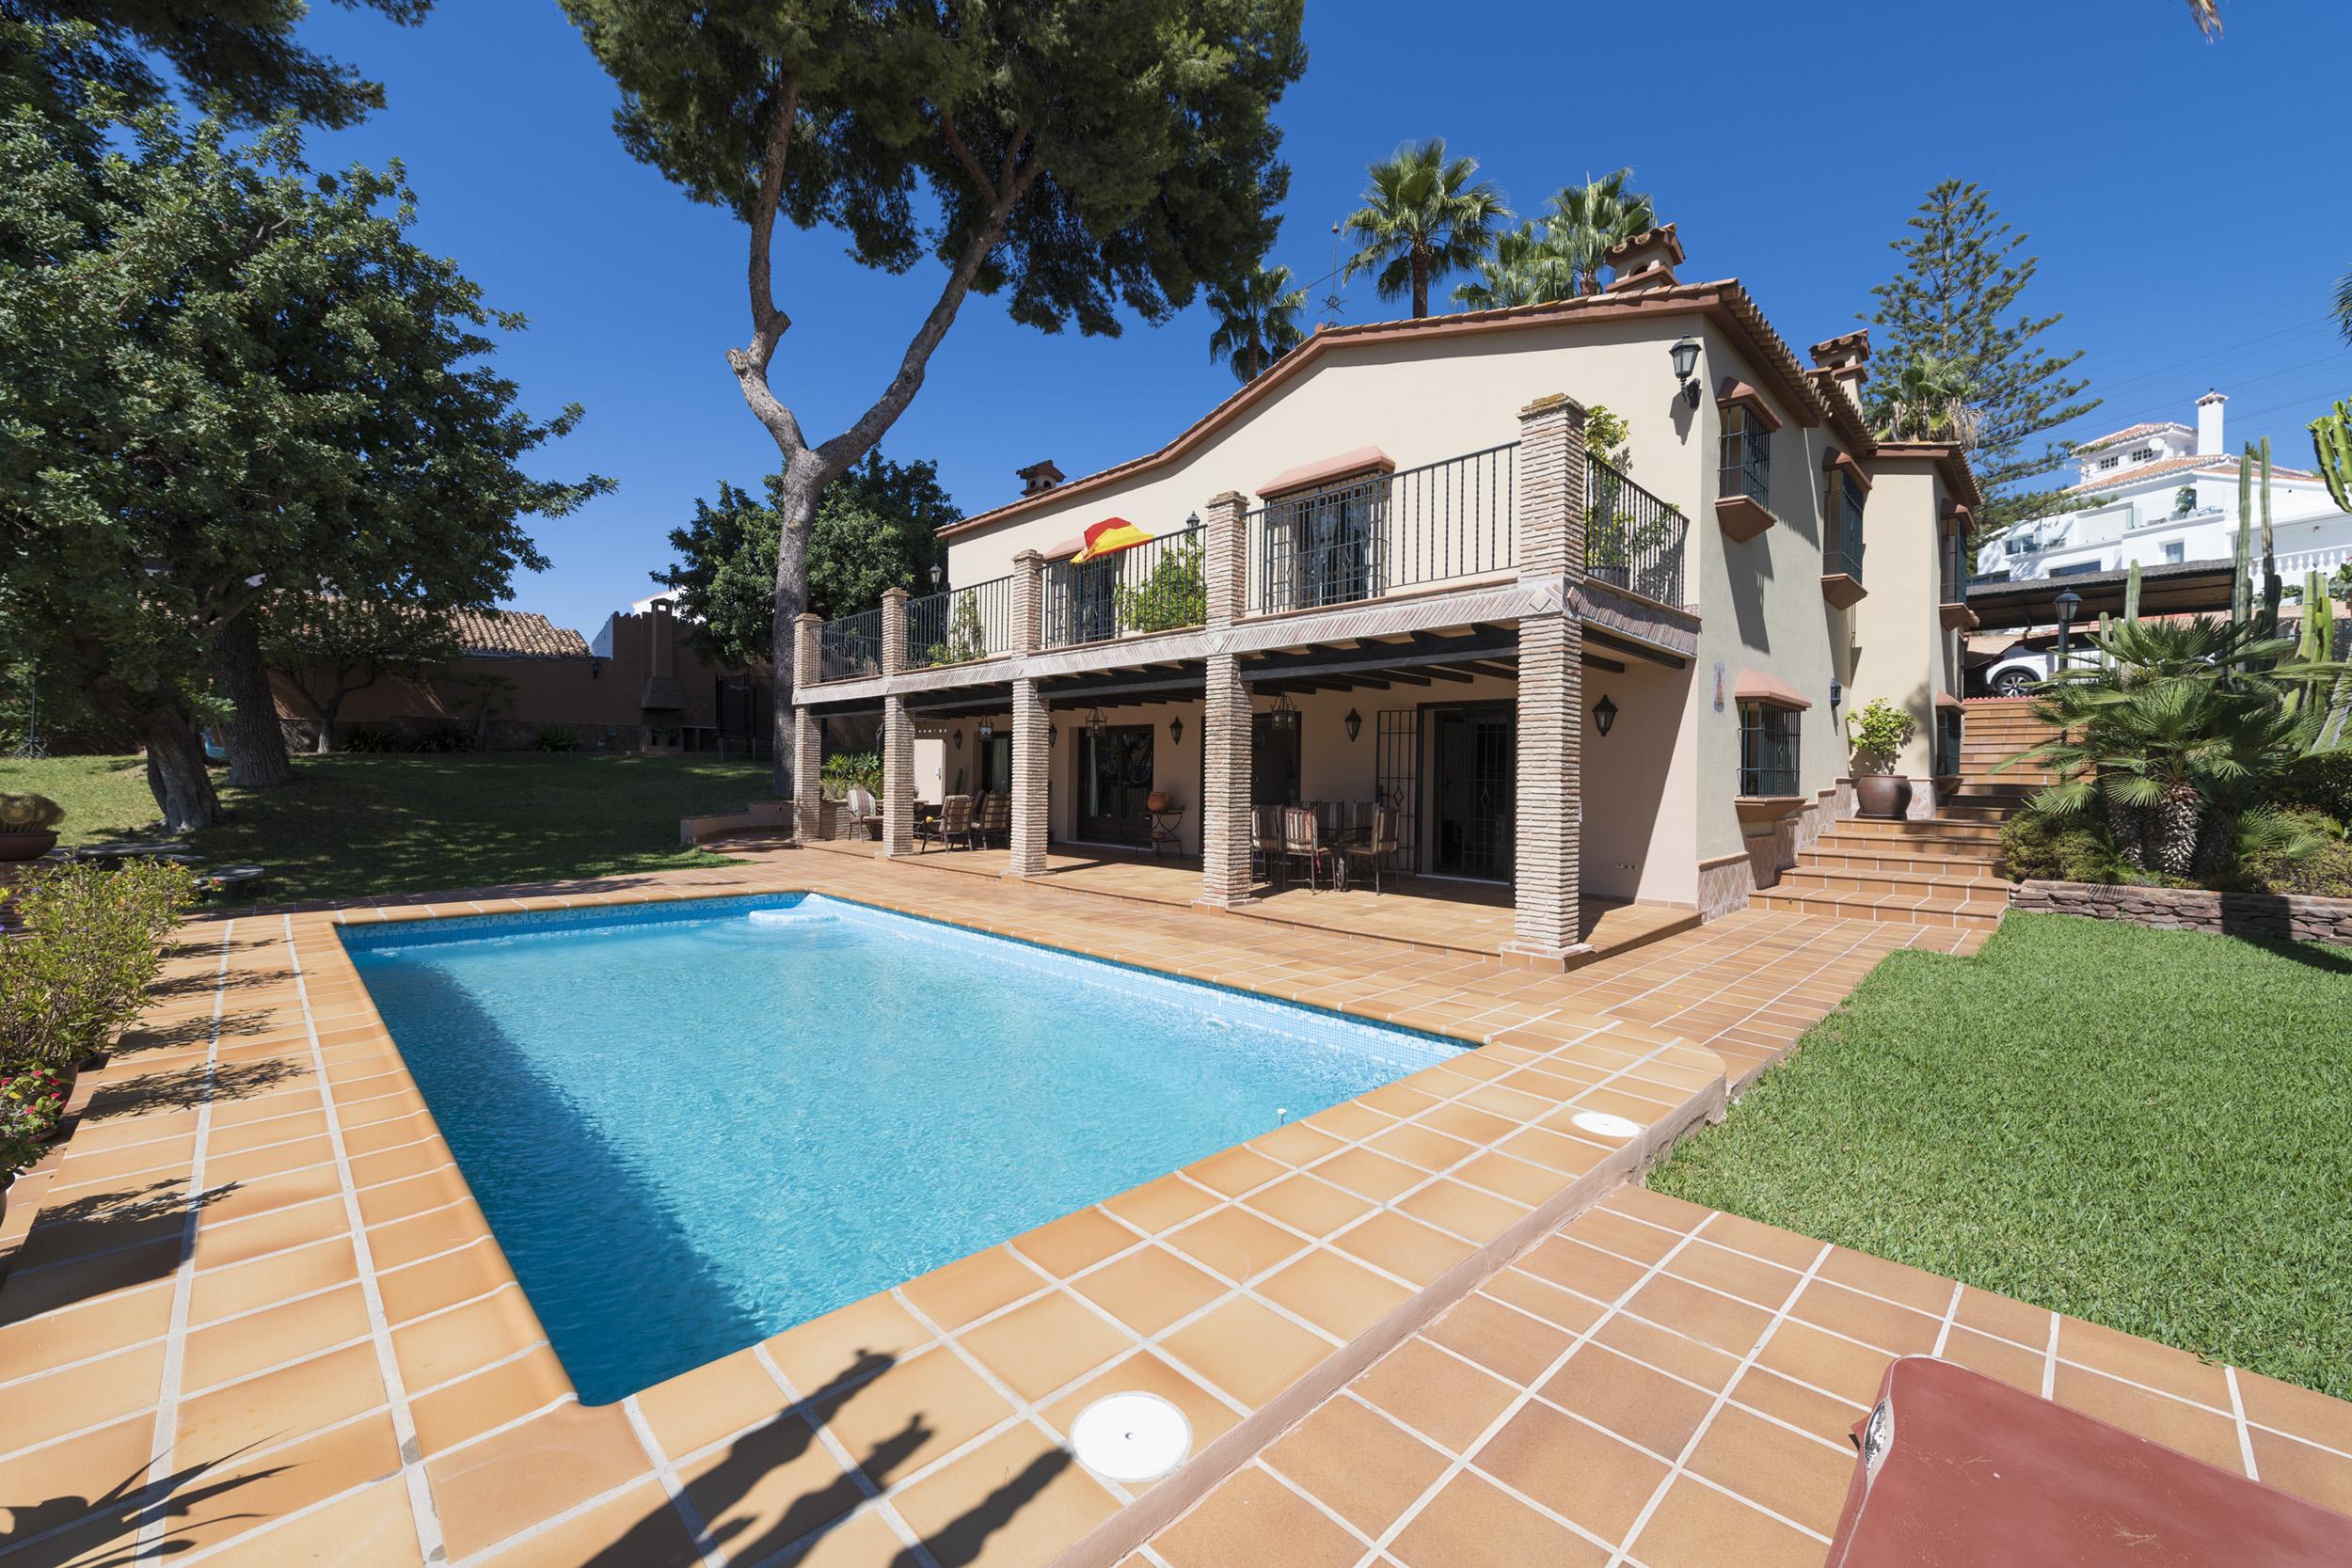 Villa in Malaga - Este